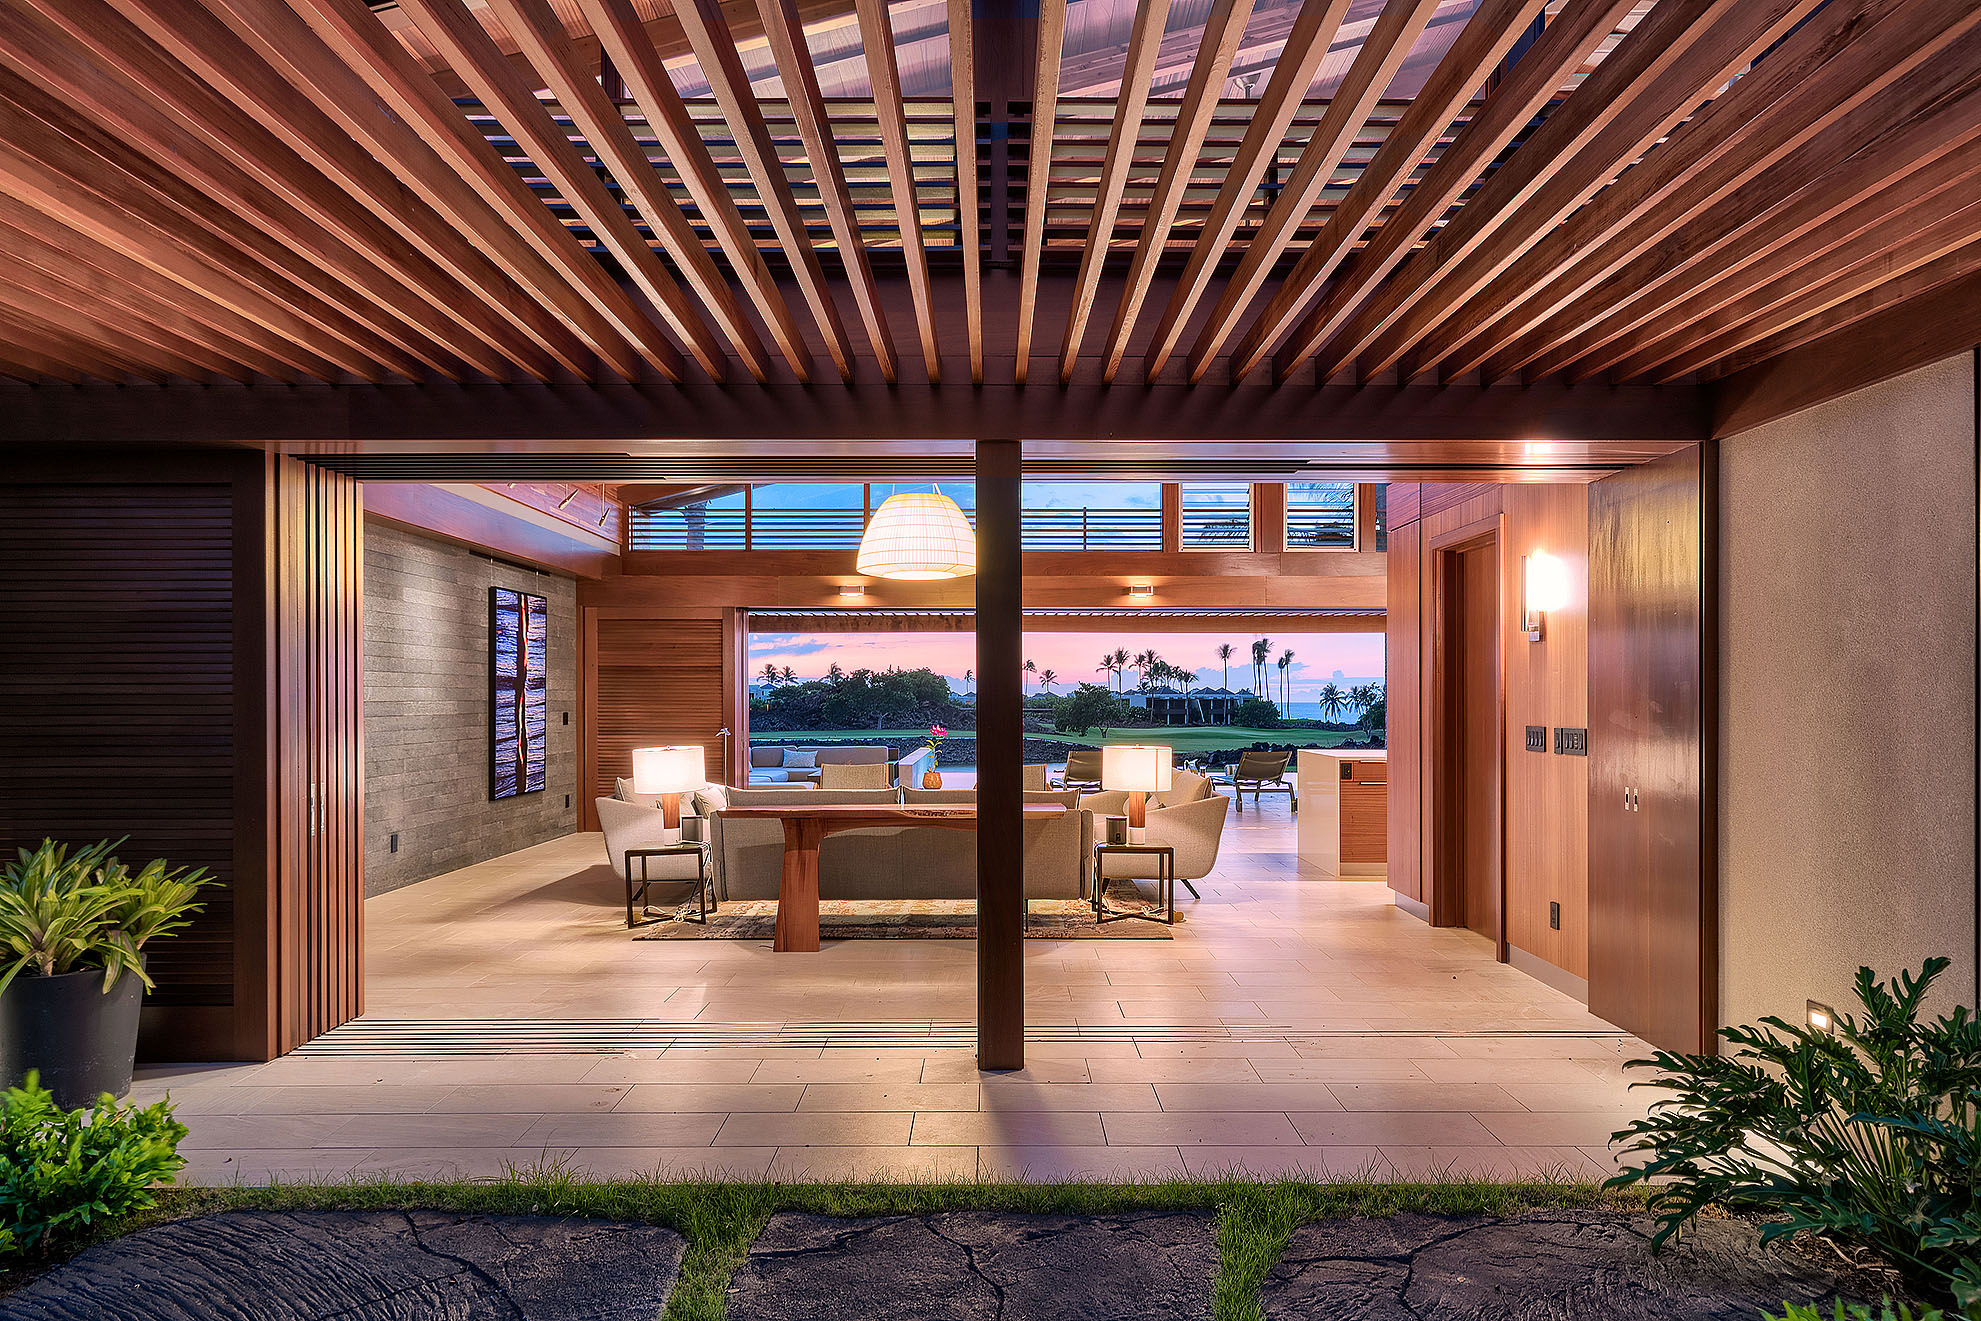 Hawaii Hotel Resort Photographer